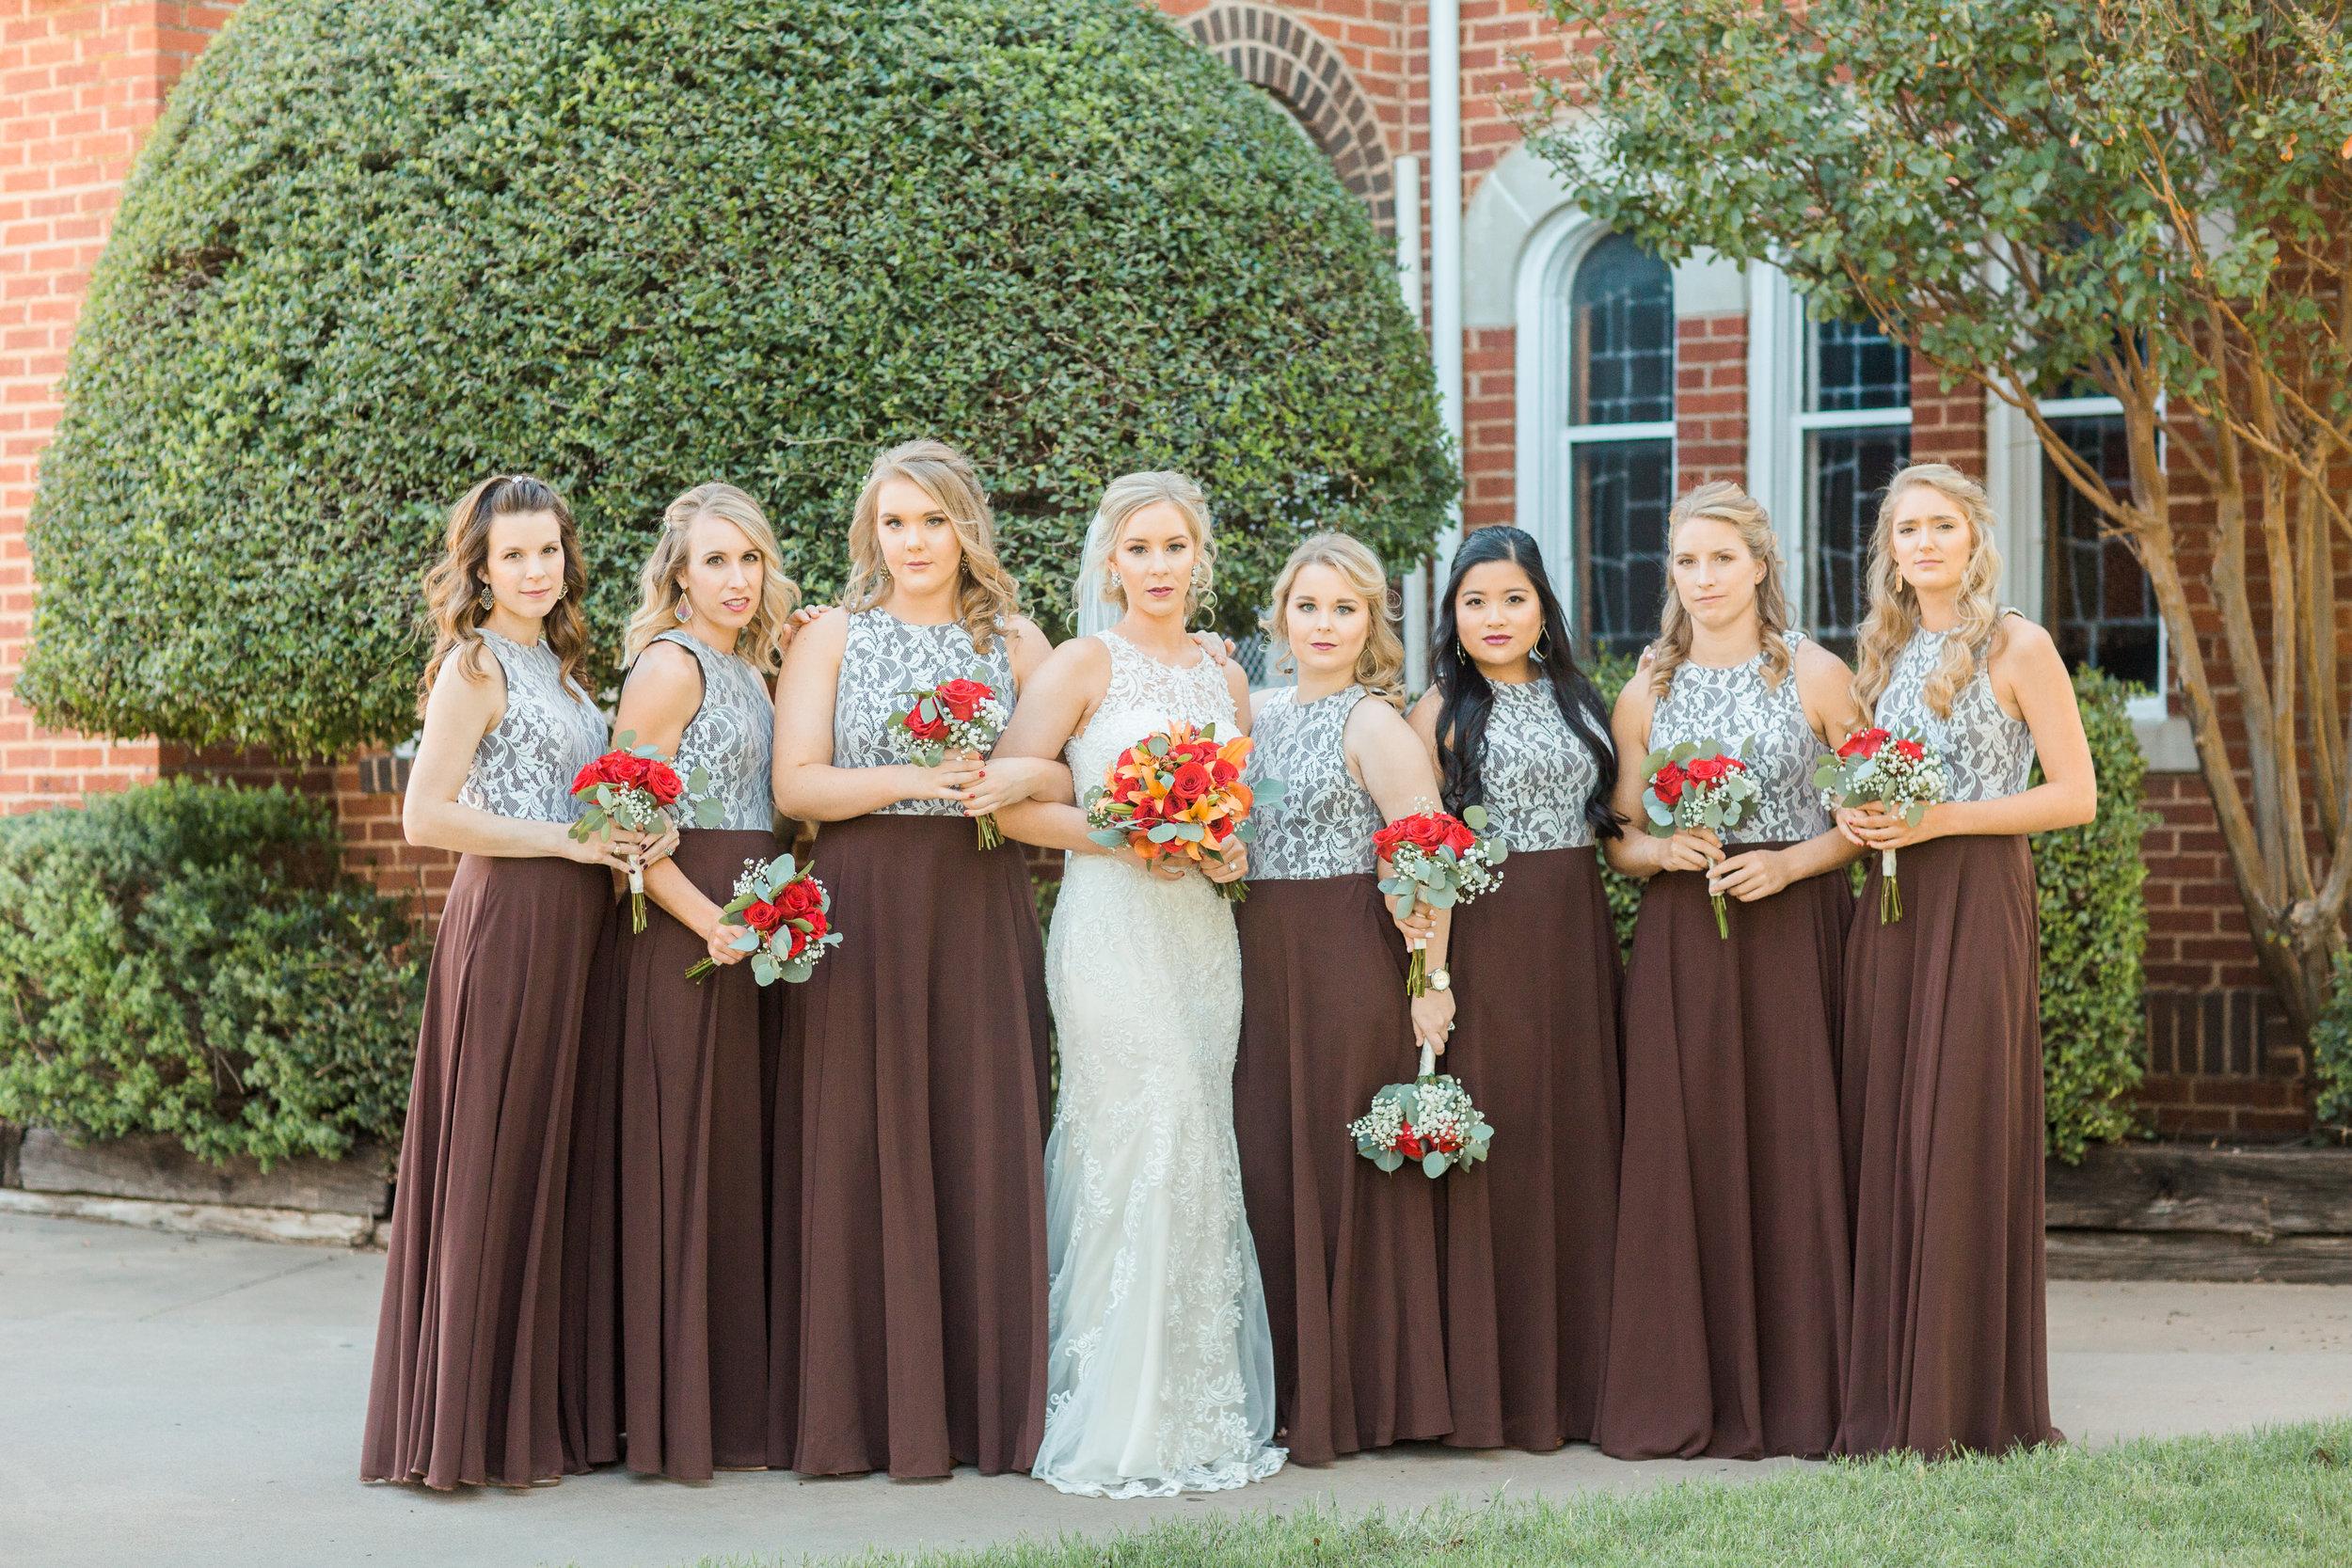 Bailey-Nathan-Windthorst-Texas-Wedding-021.jpg